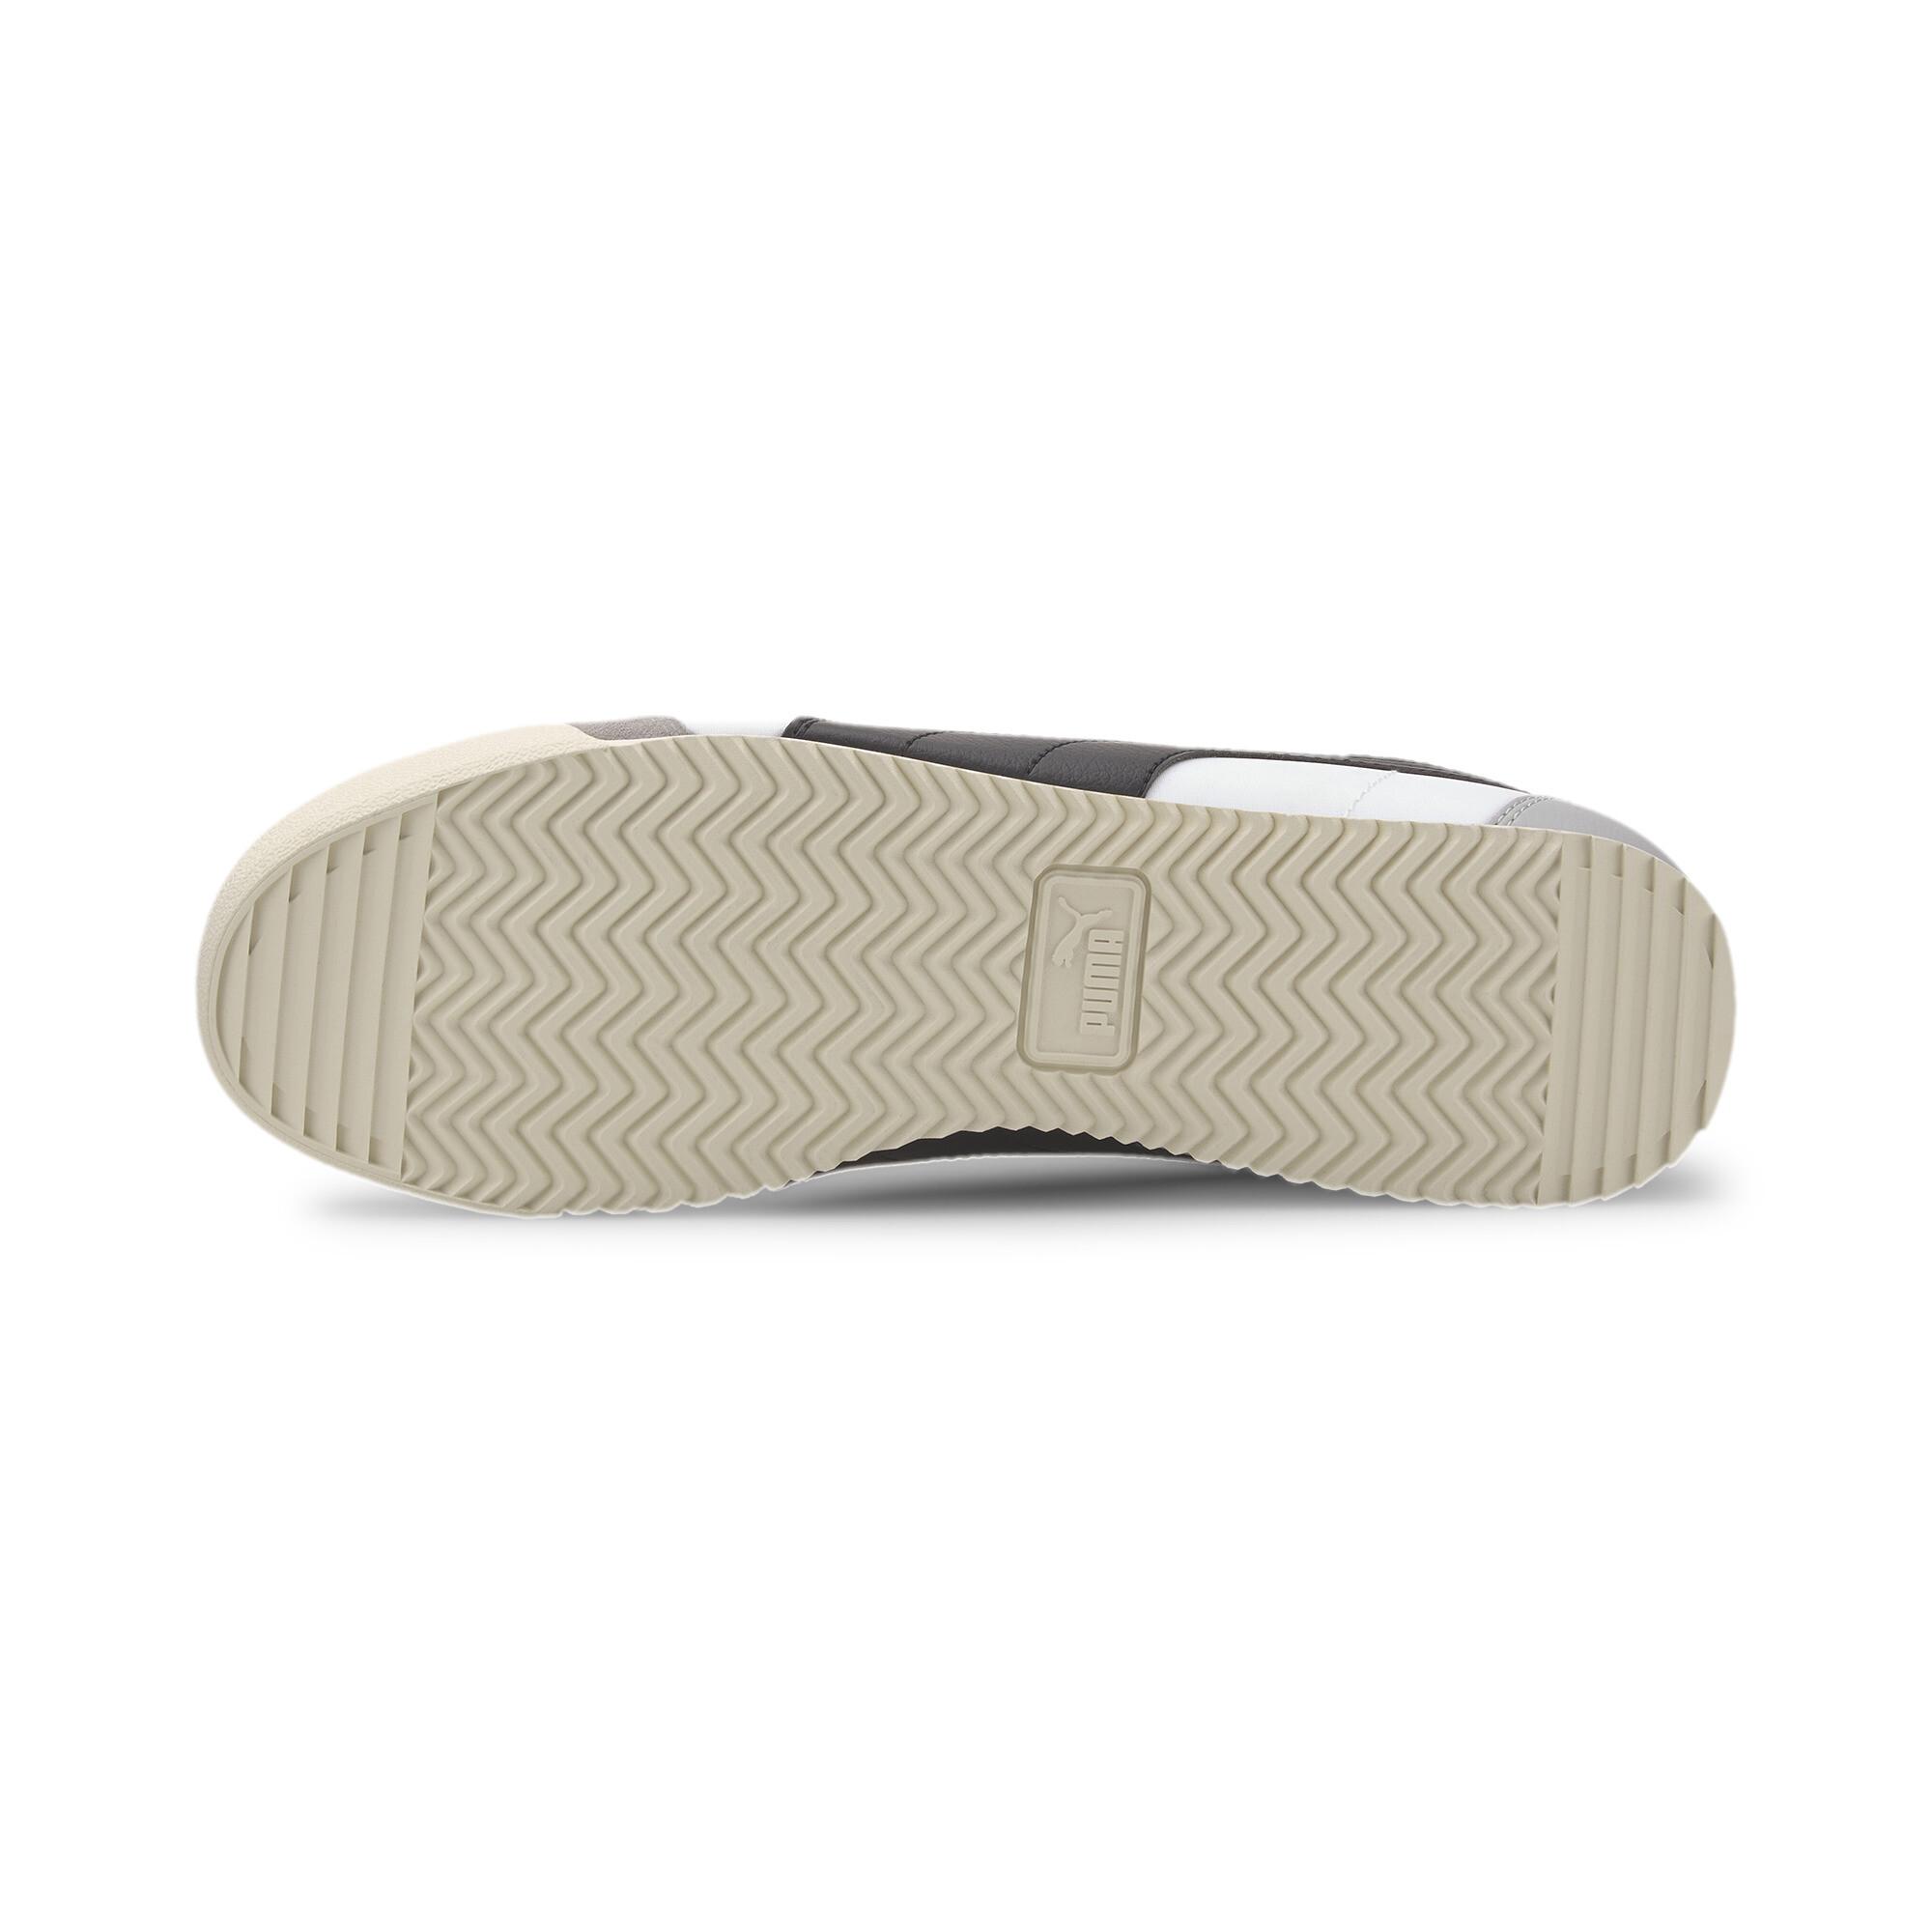 PUMA-Men-039-s-Turino-NL-Sneakers thumbnail 6